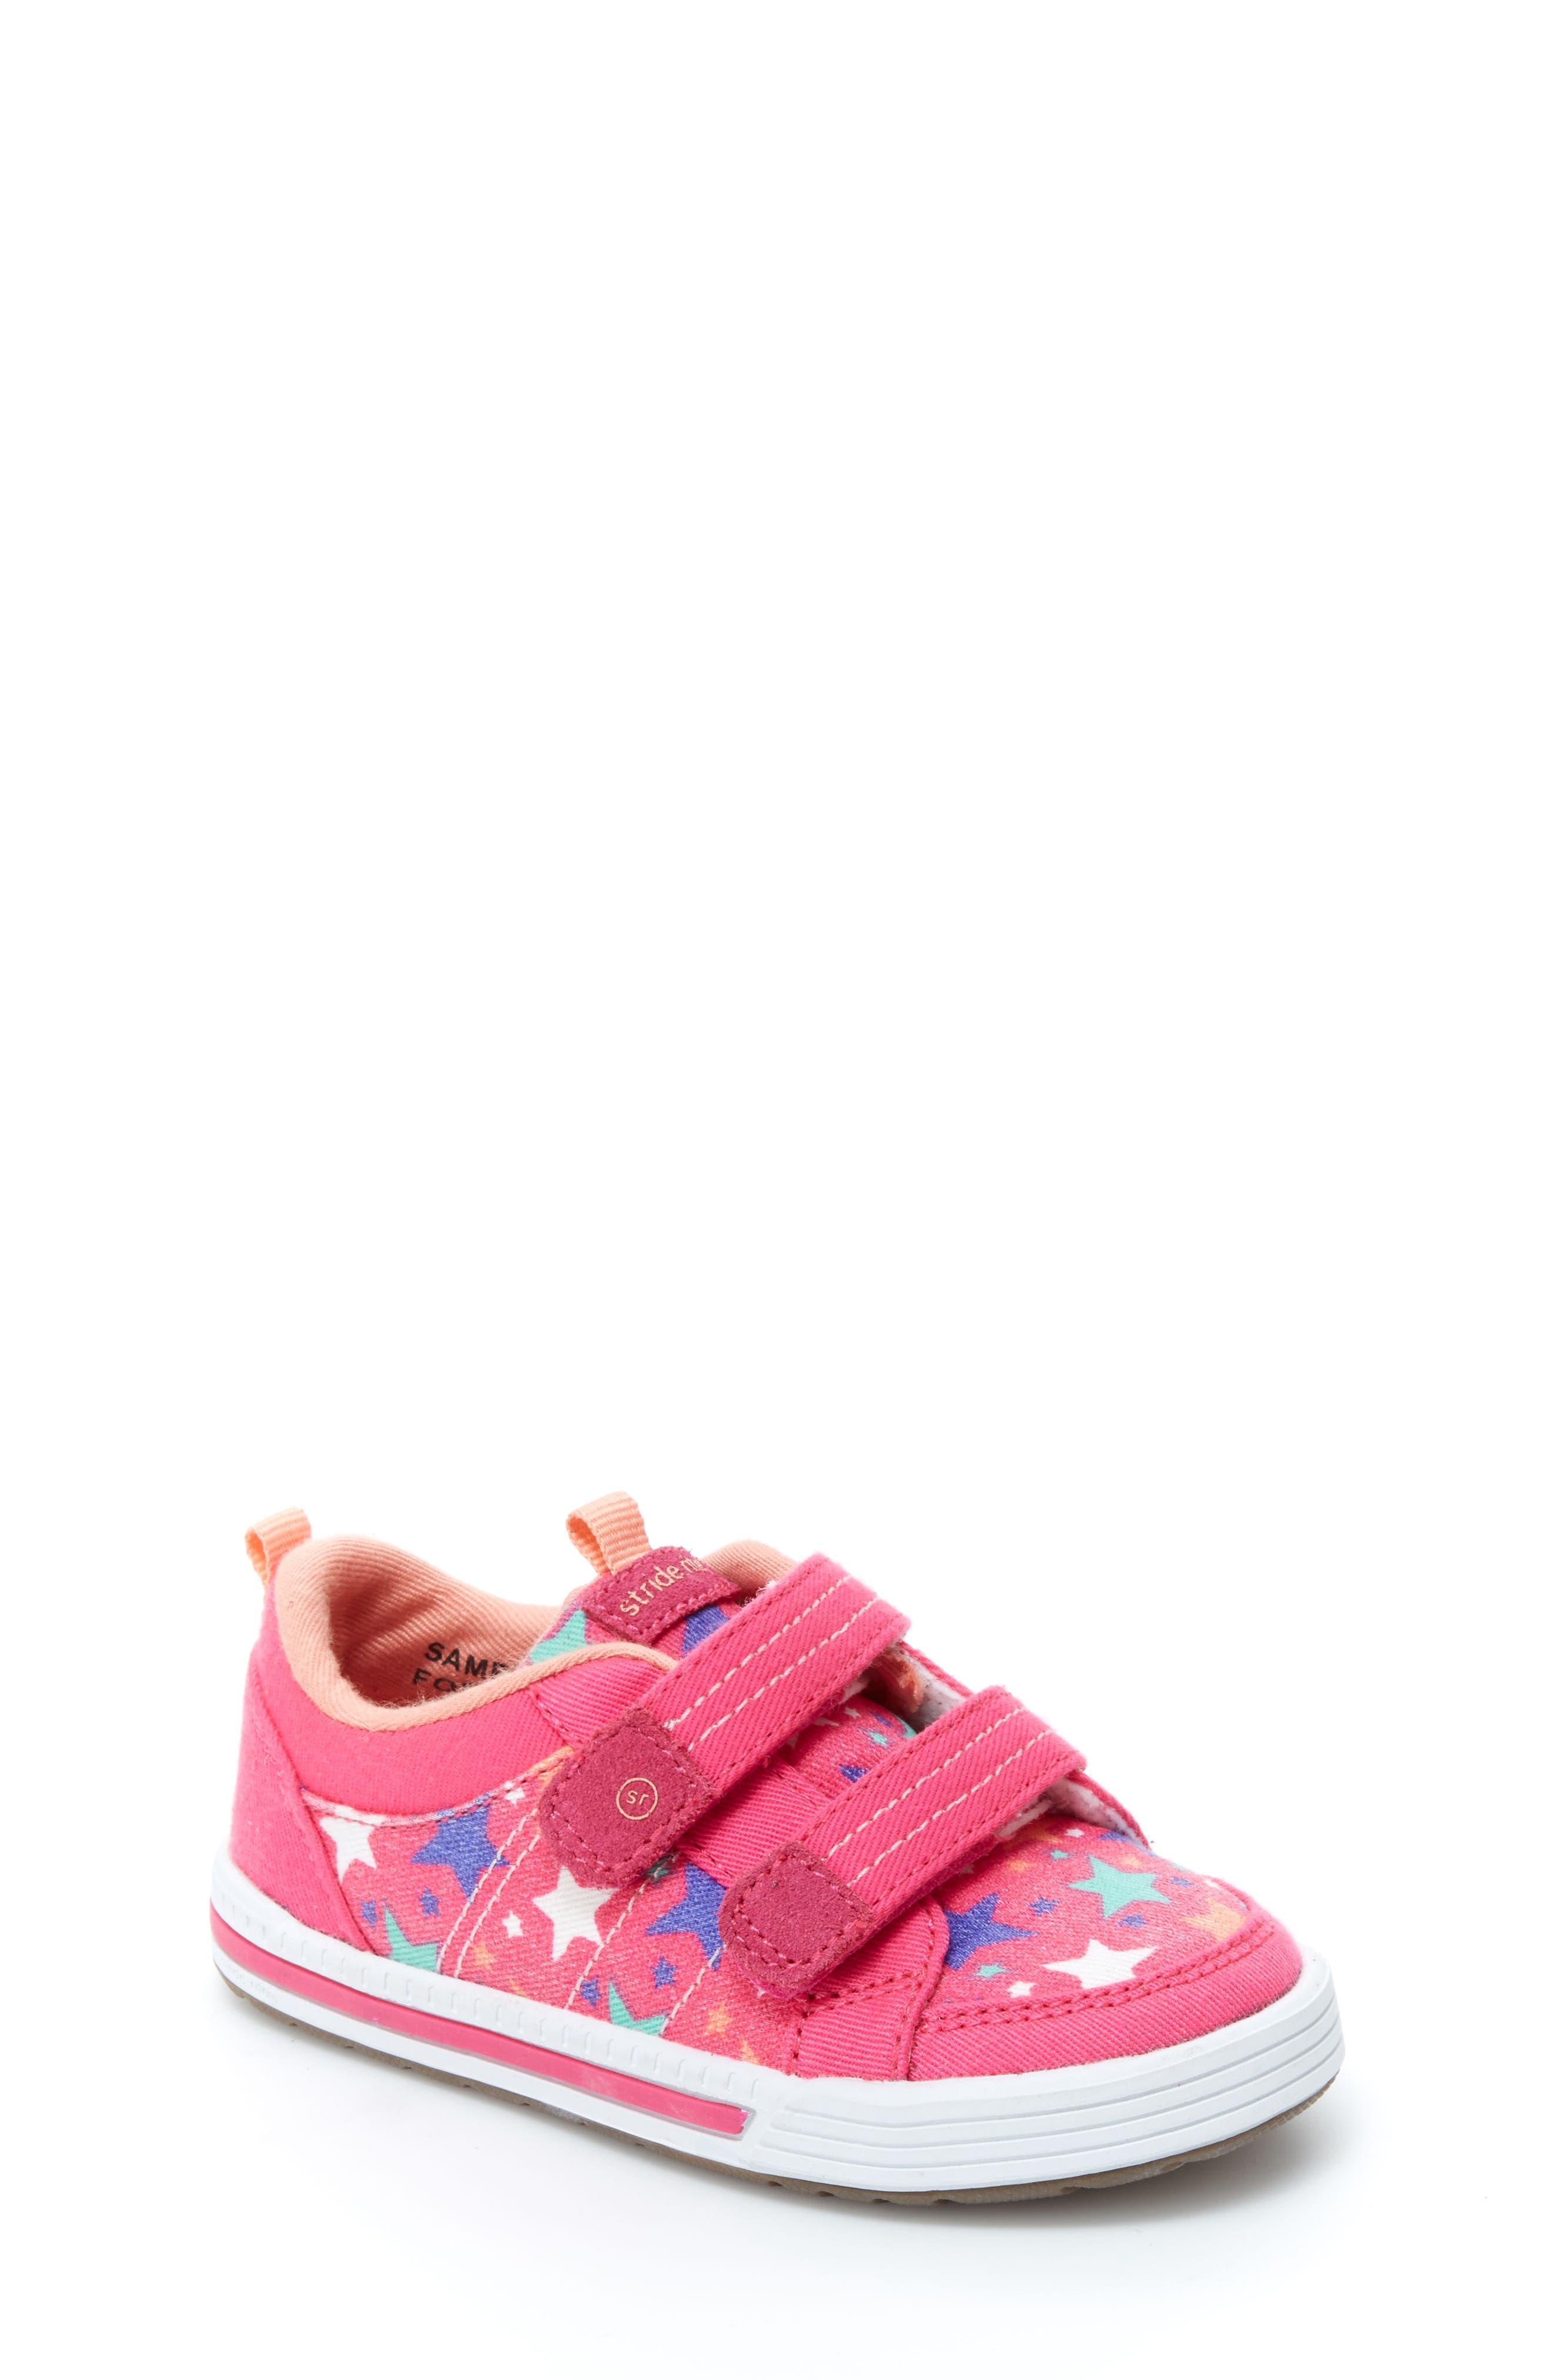 Logan Patterned Sneaker,                             Main thumbnail 1, color,                             650